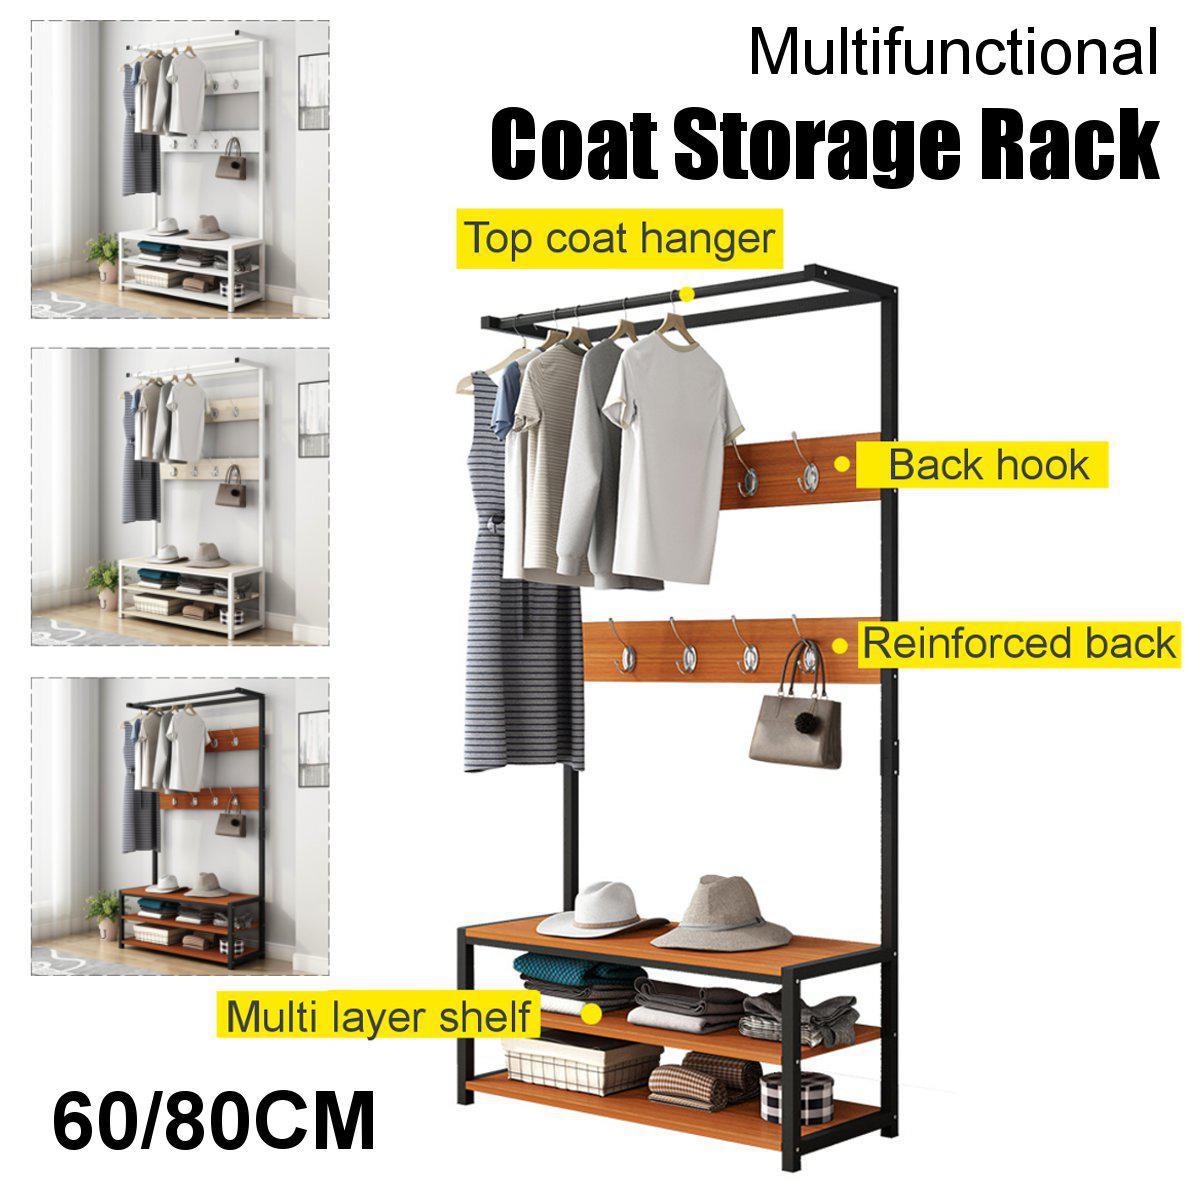 170cm Standing Coat Hat Rack Shelf Clothes Shoe Bench Bag Hanger Storage Holder Black 80x34x170cm Matt Blatt